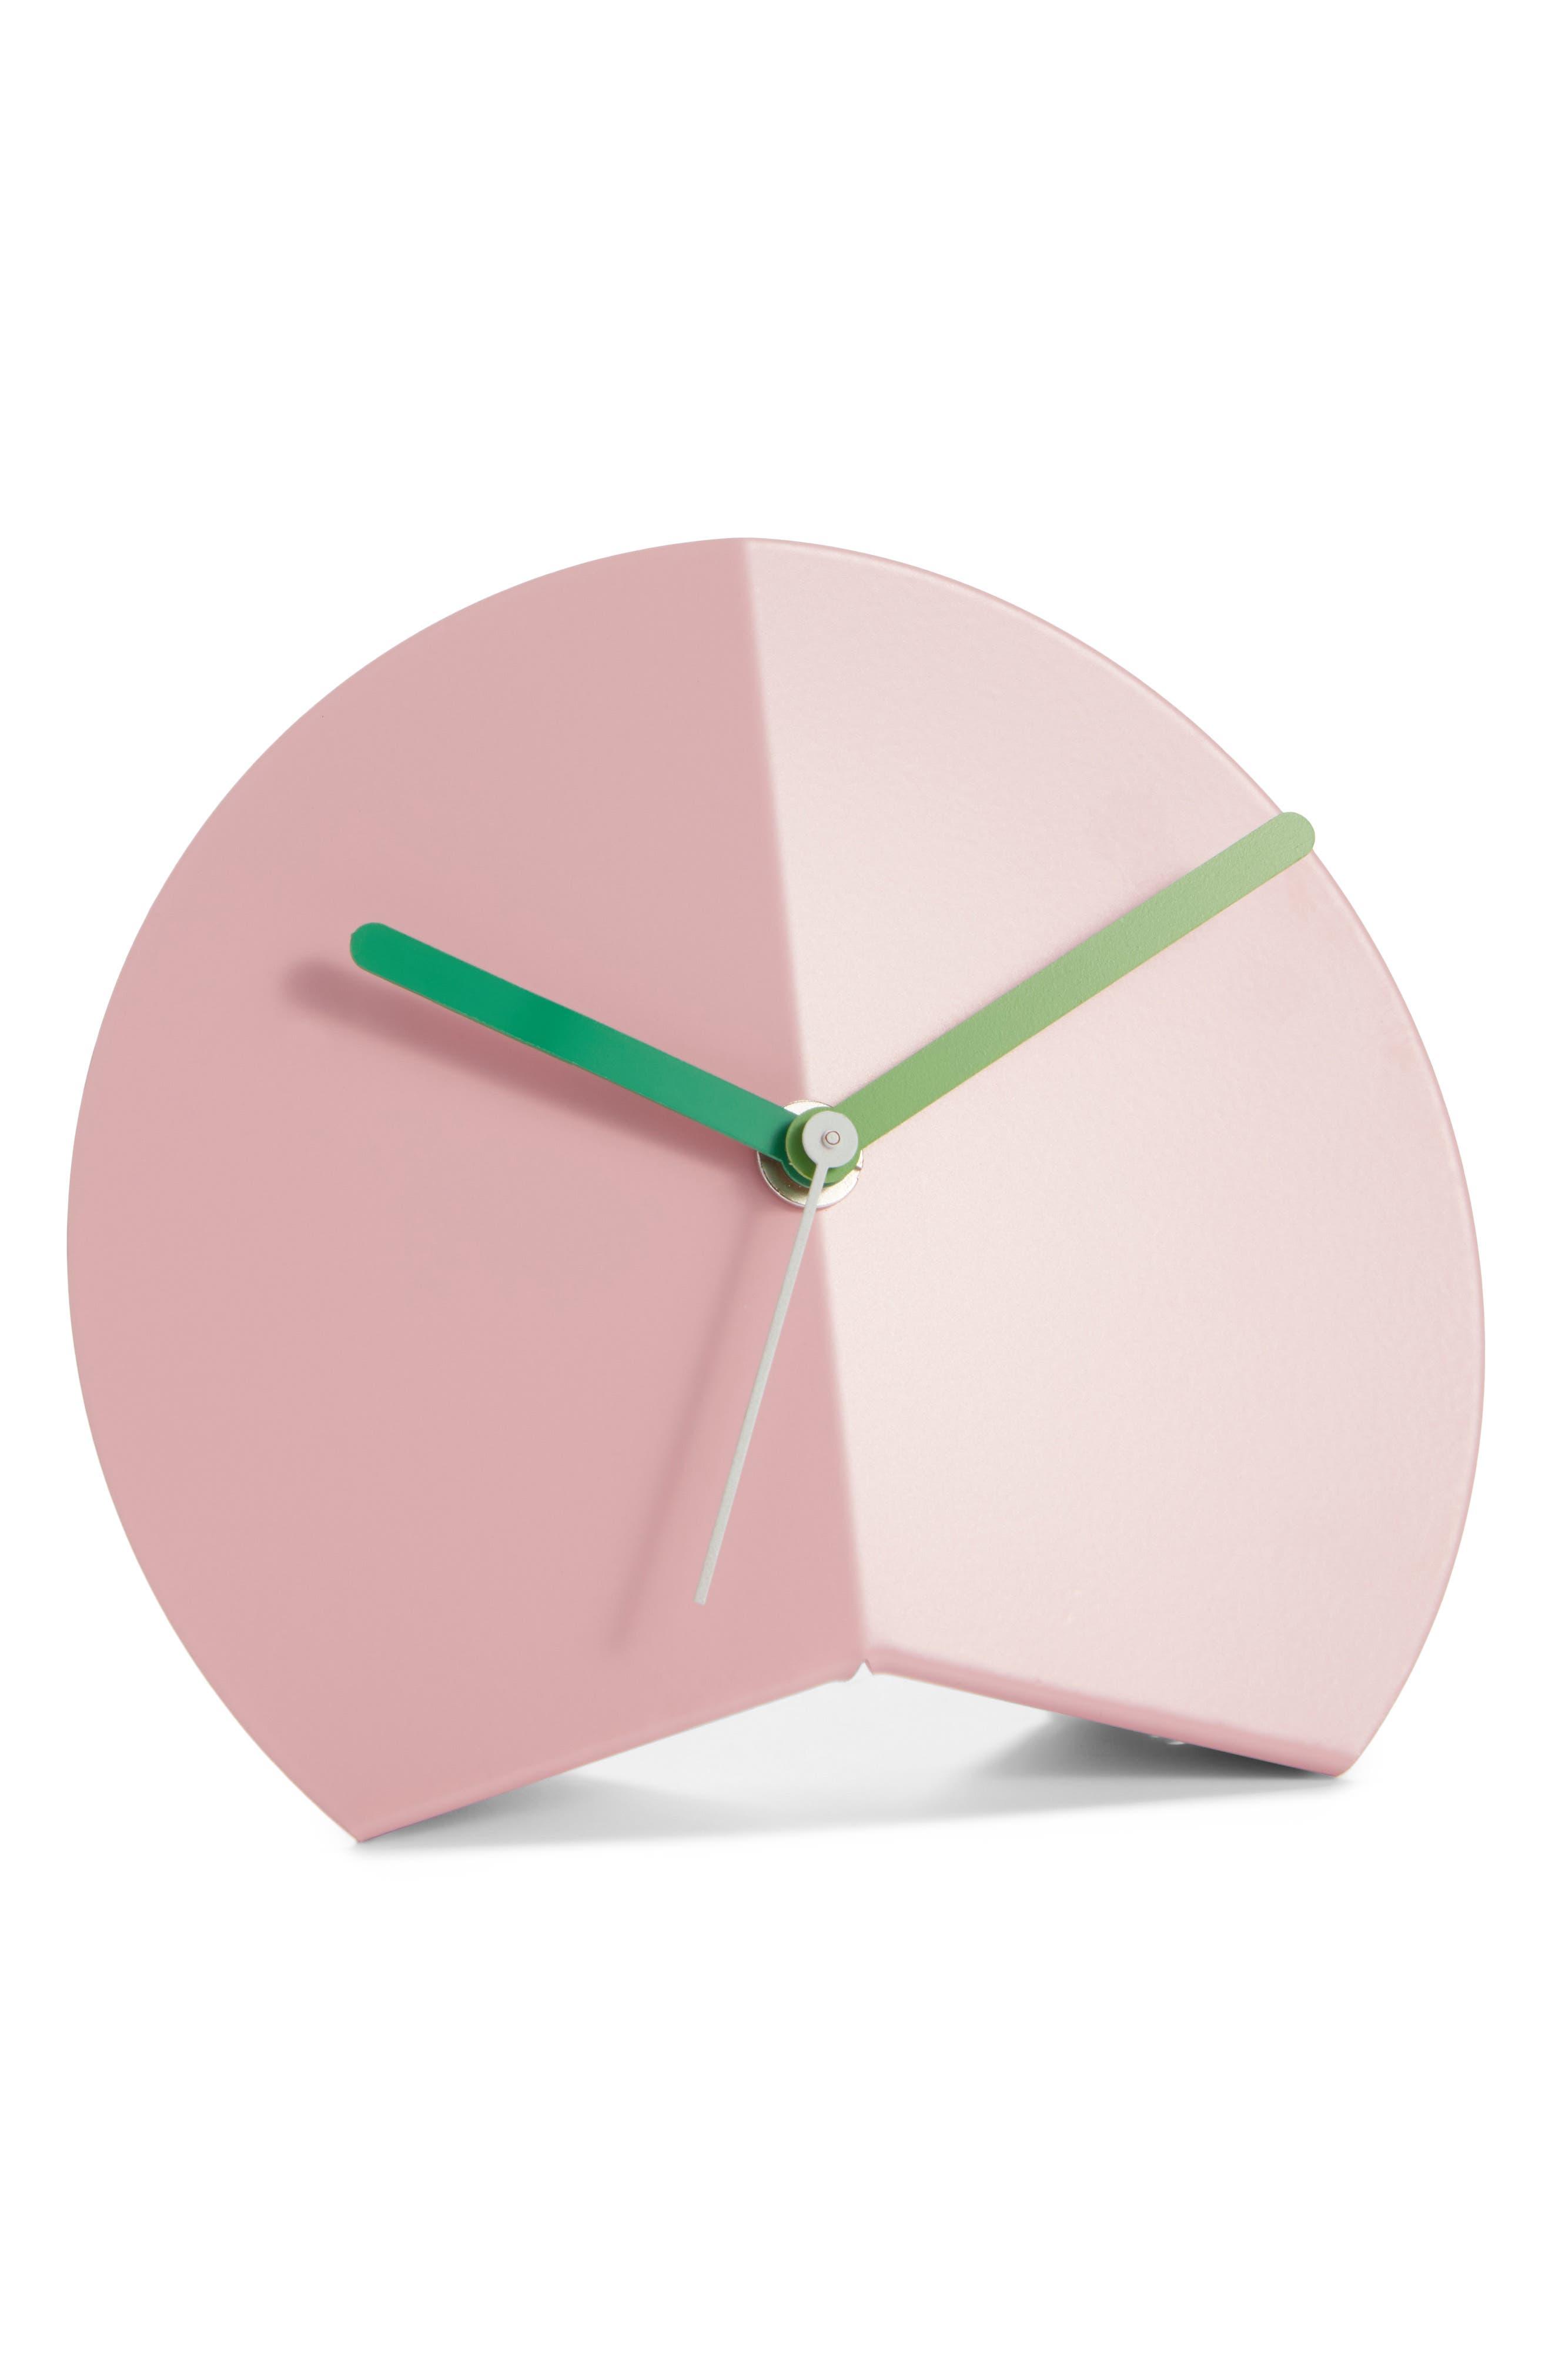 Mountain Fold Desk Clock,                             Main thumbnail 1, color,                             PINK